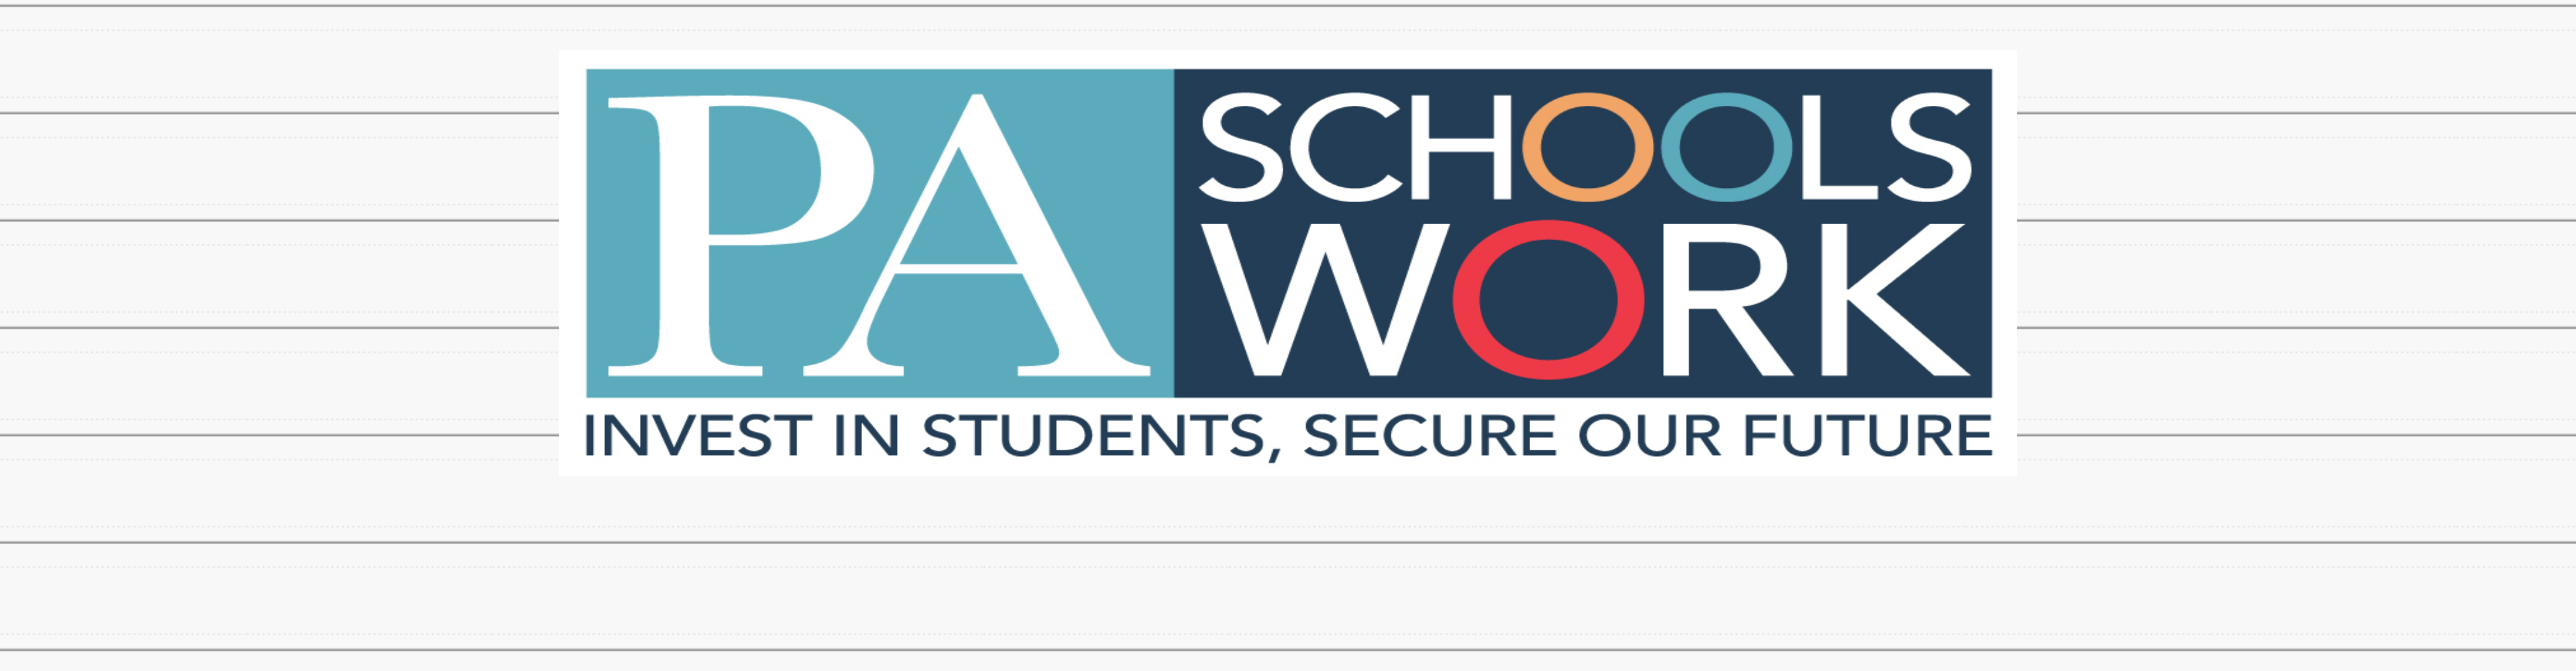 PA Schools Work_PPC slider